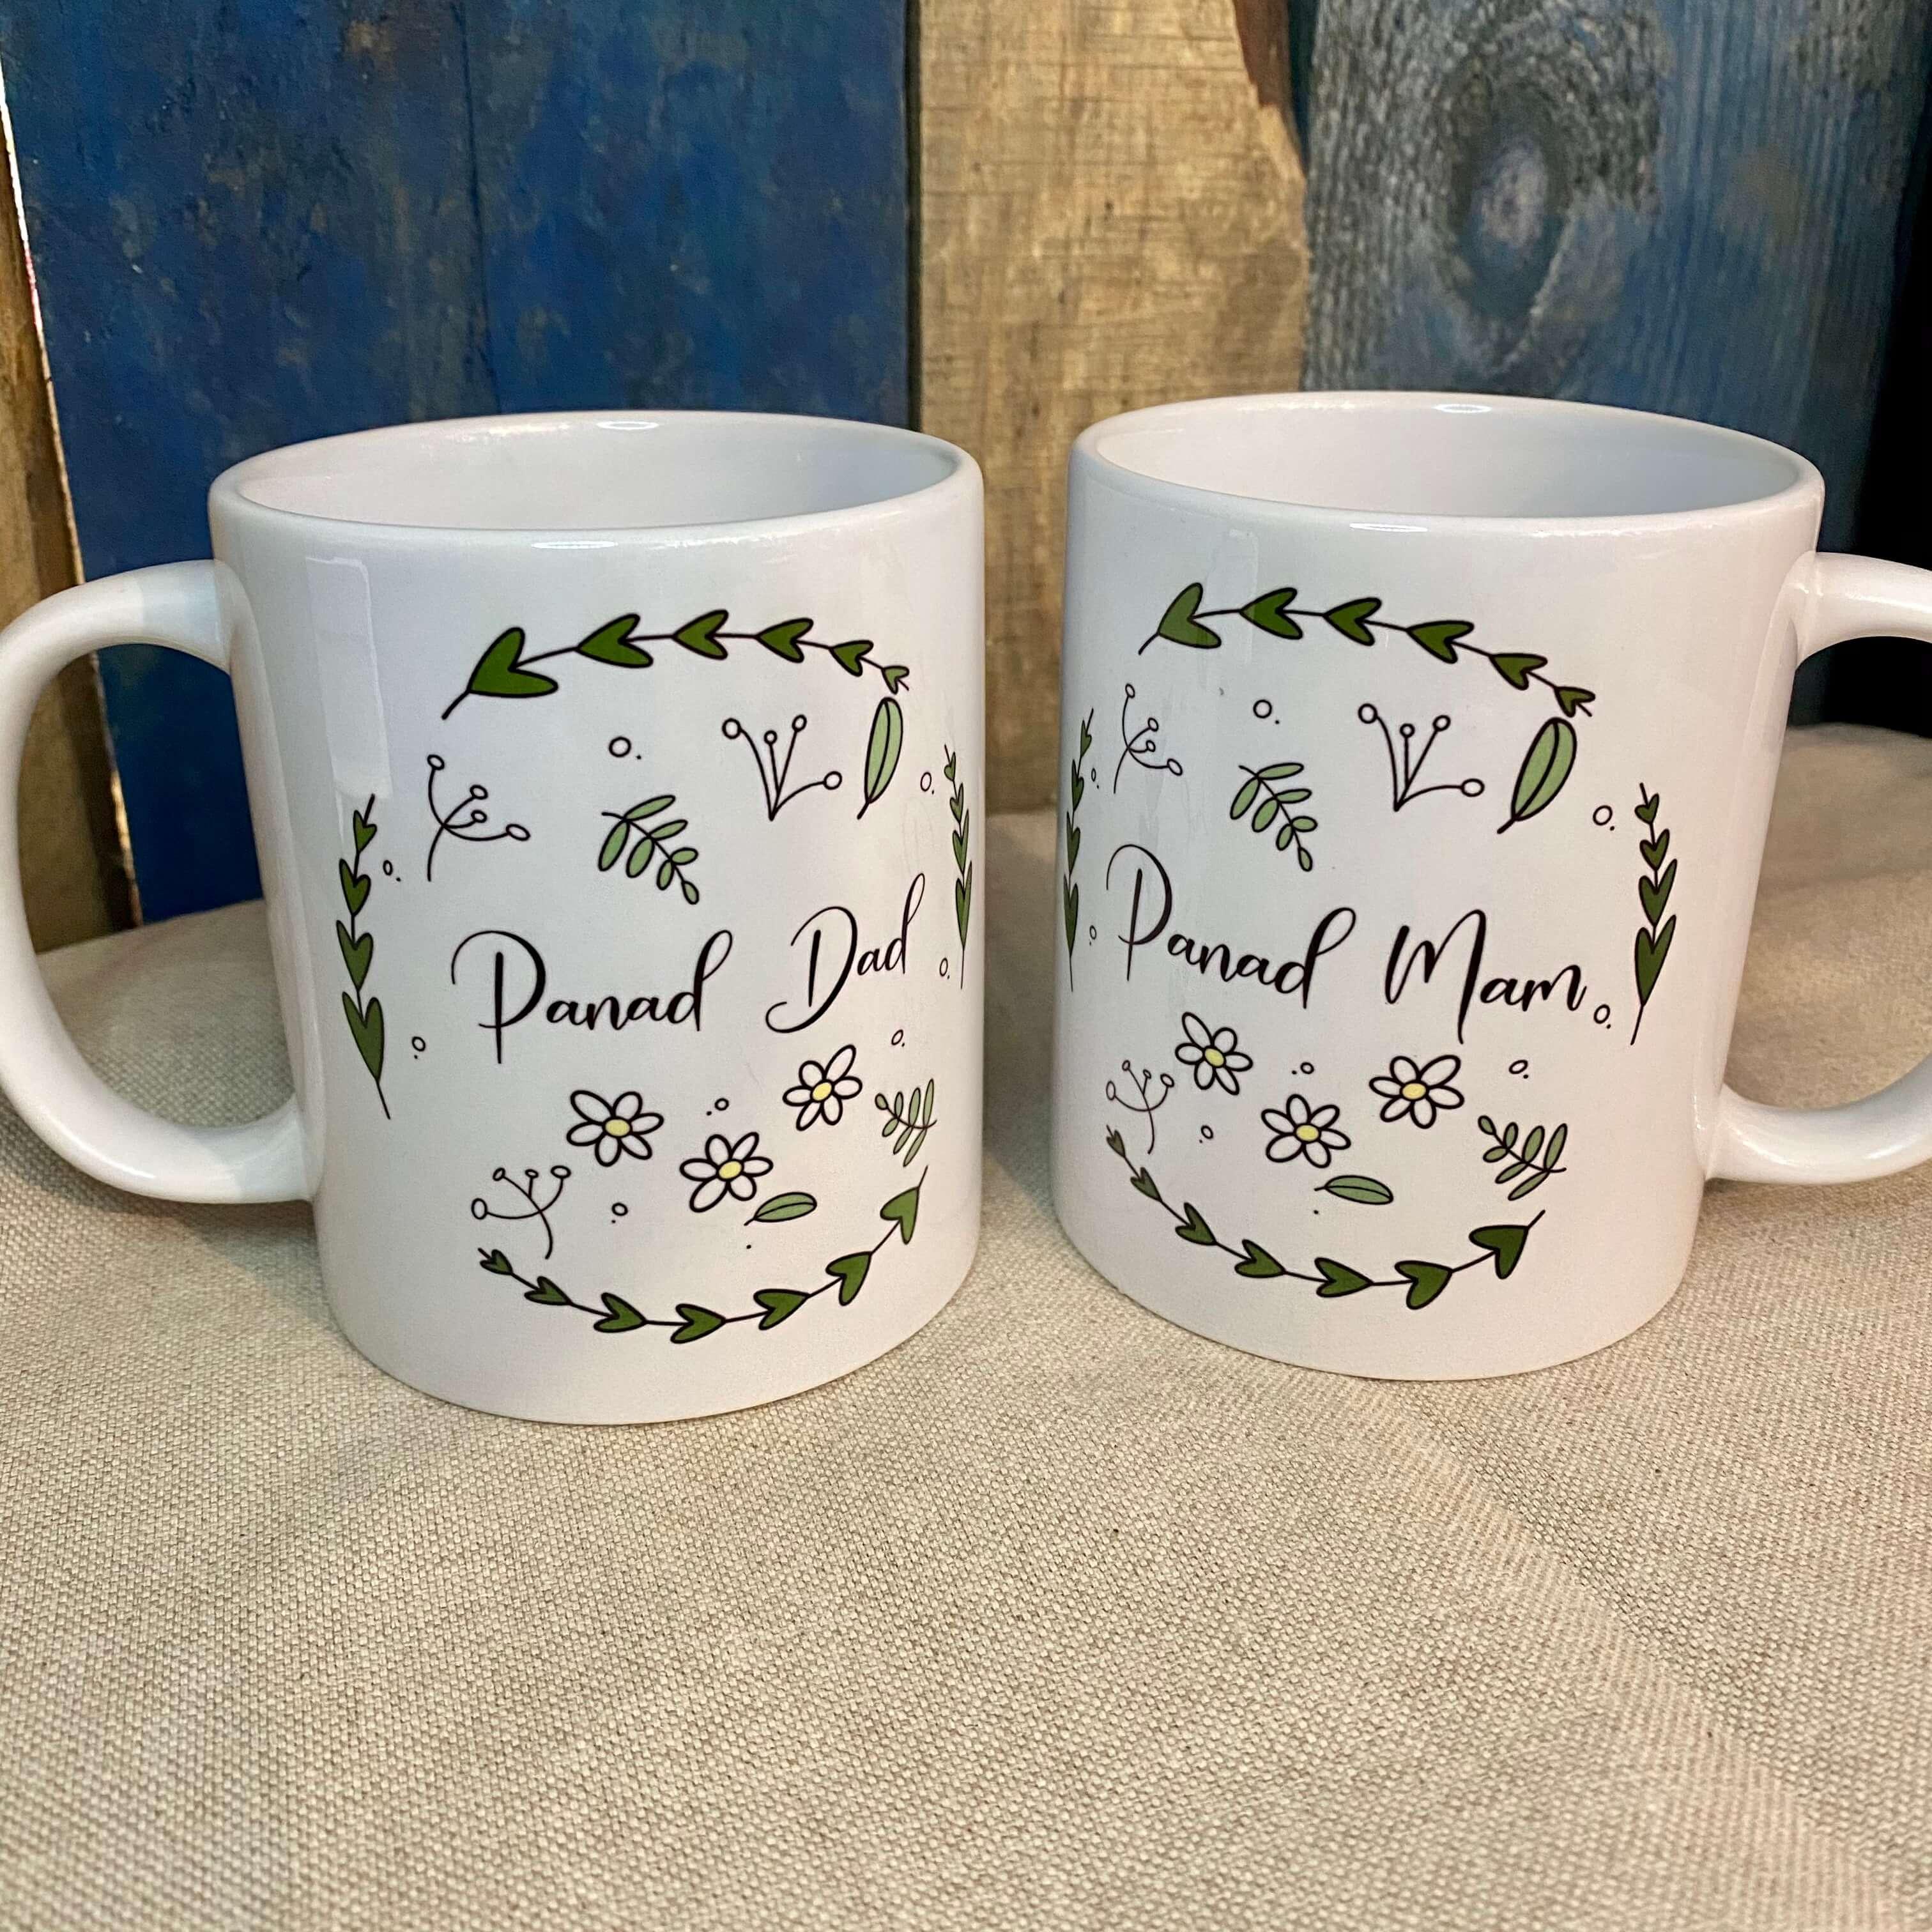 Mug Panad Mam/Dad